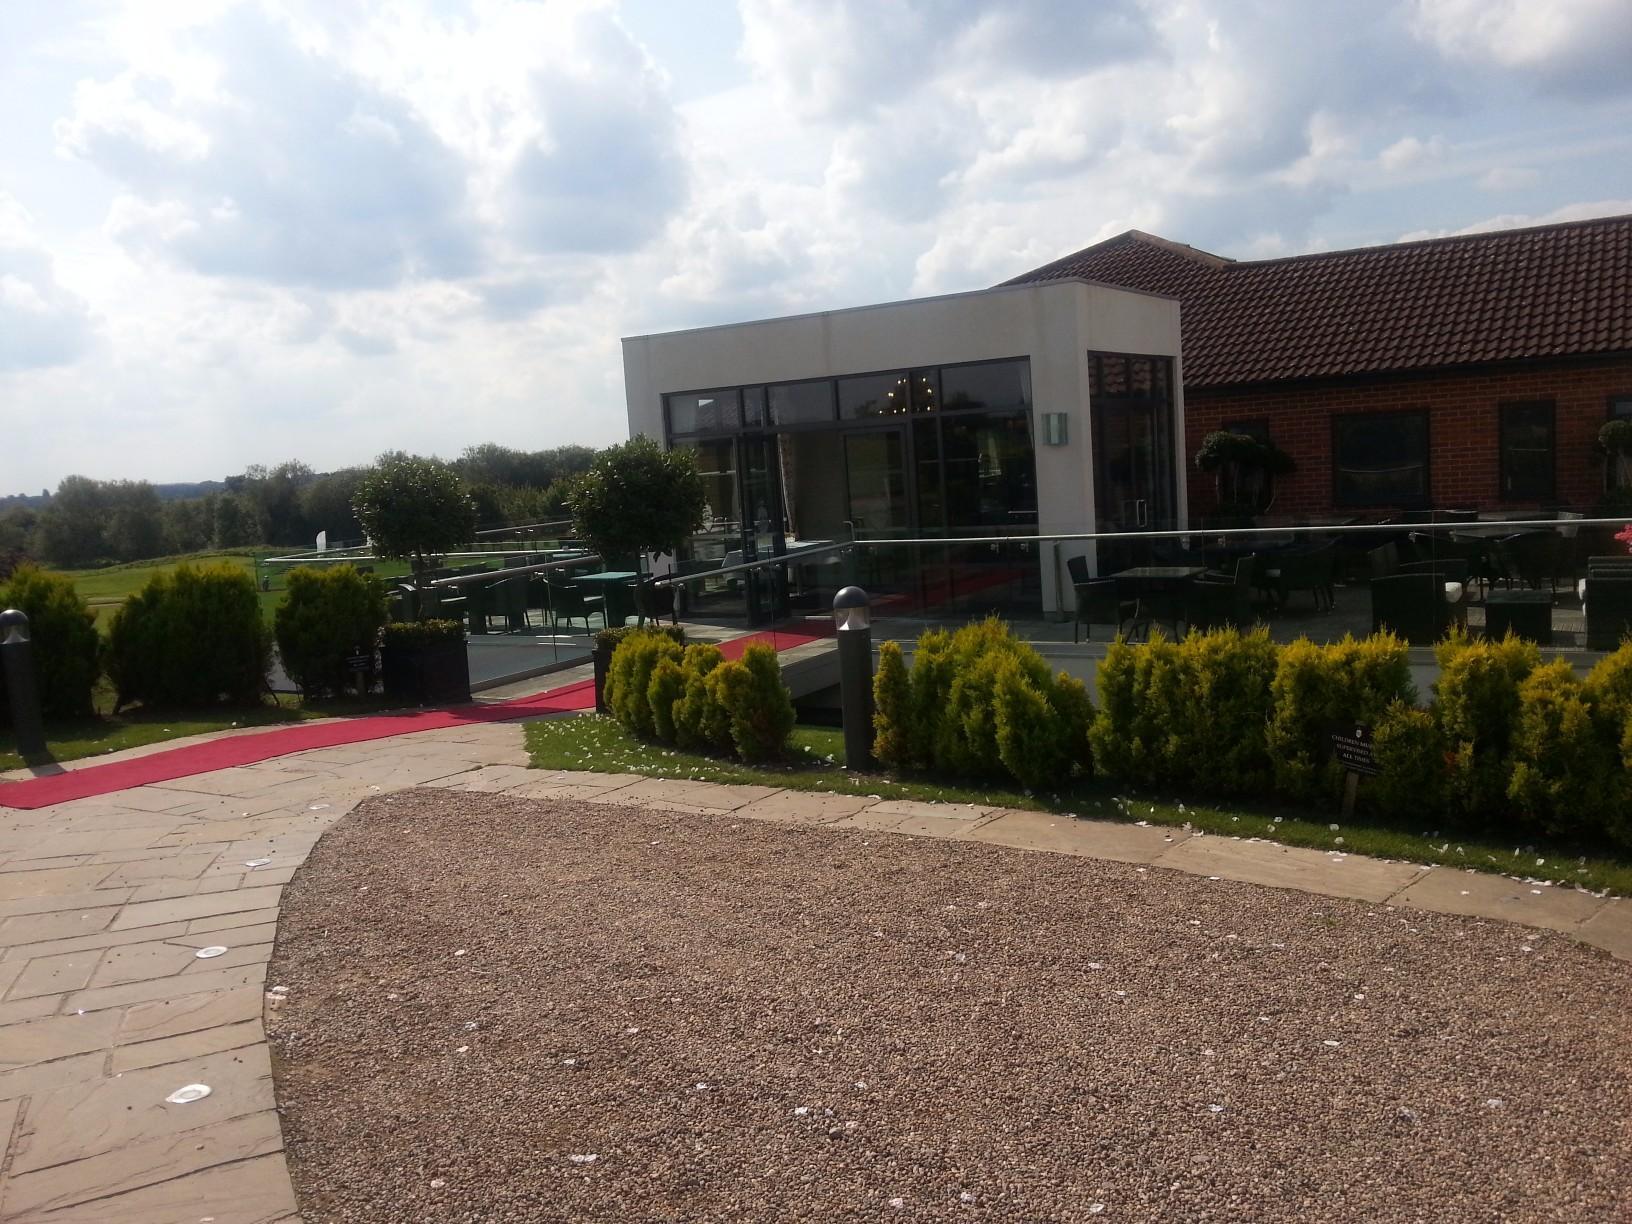 Nottinghamshire Golf Country Club Steelasophical SteelBand Dj Wedding